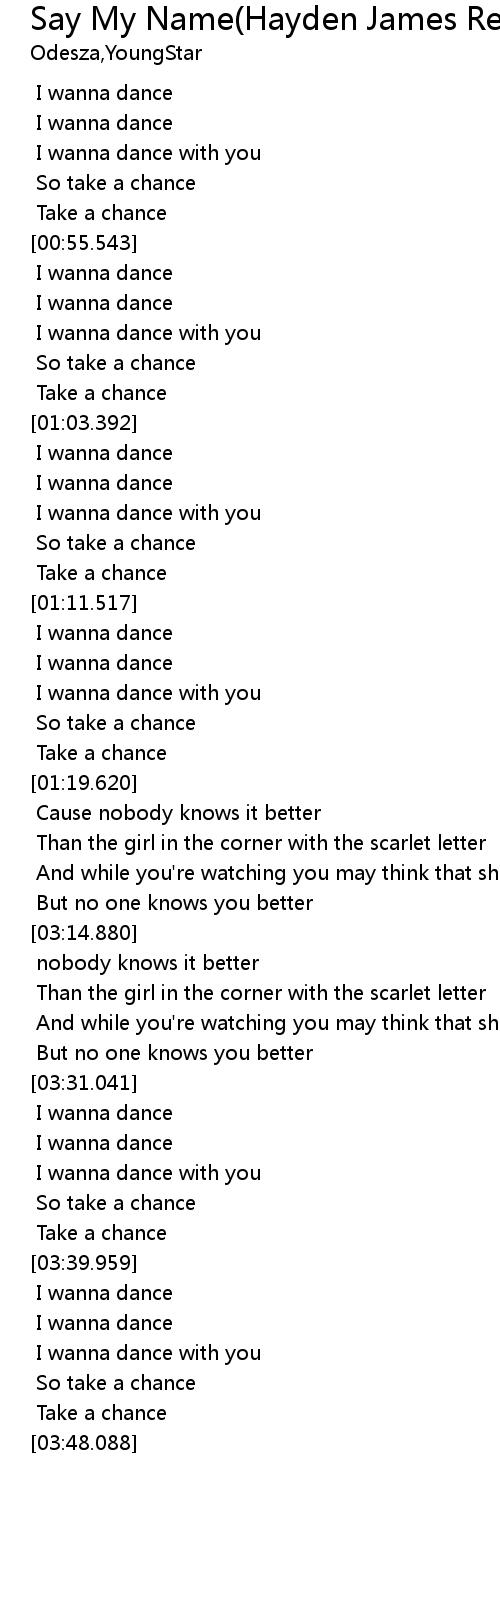 Say My Name Hayden James Remix Lyrics Follow Lyrics Lyrics to nobody lyricsmania staff is working hard for you to add nobody lyrics as soon as they'll be released by james arthur, check back soon! say my name hayden james remix lyrics